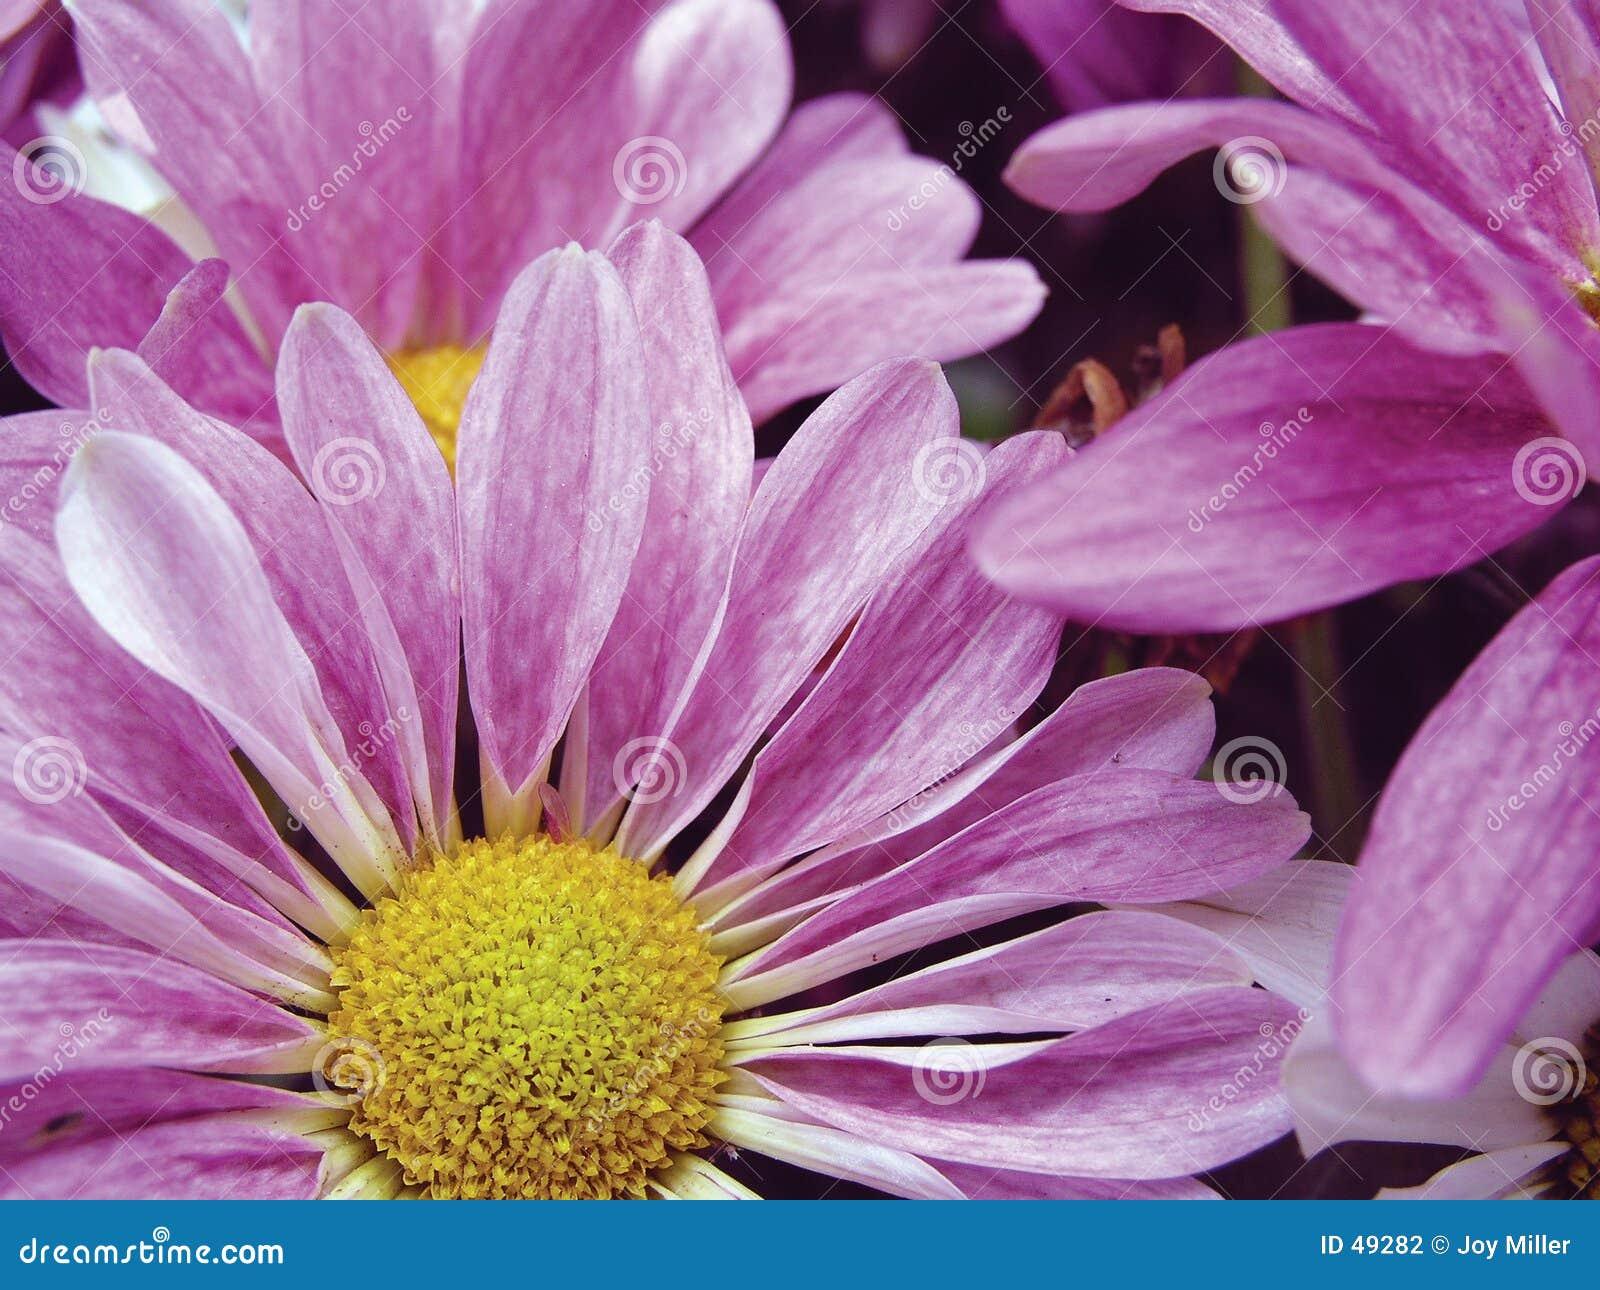 Lavendelgänseblümchen